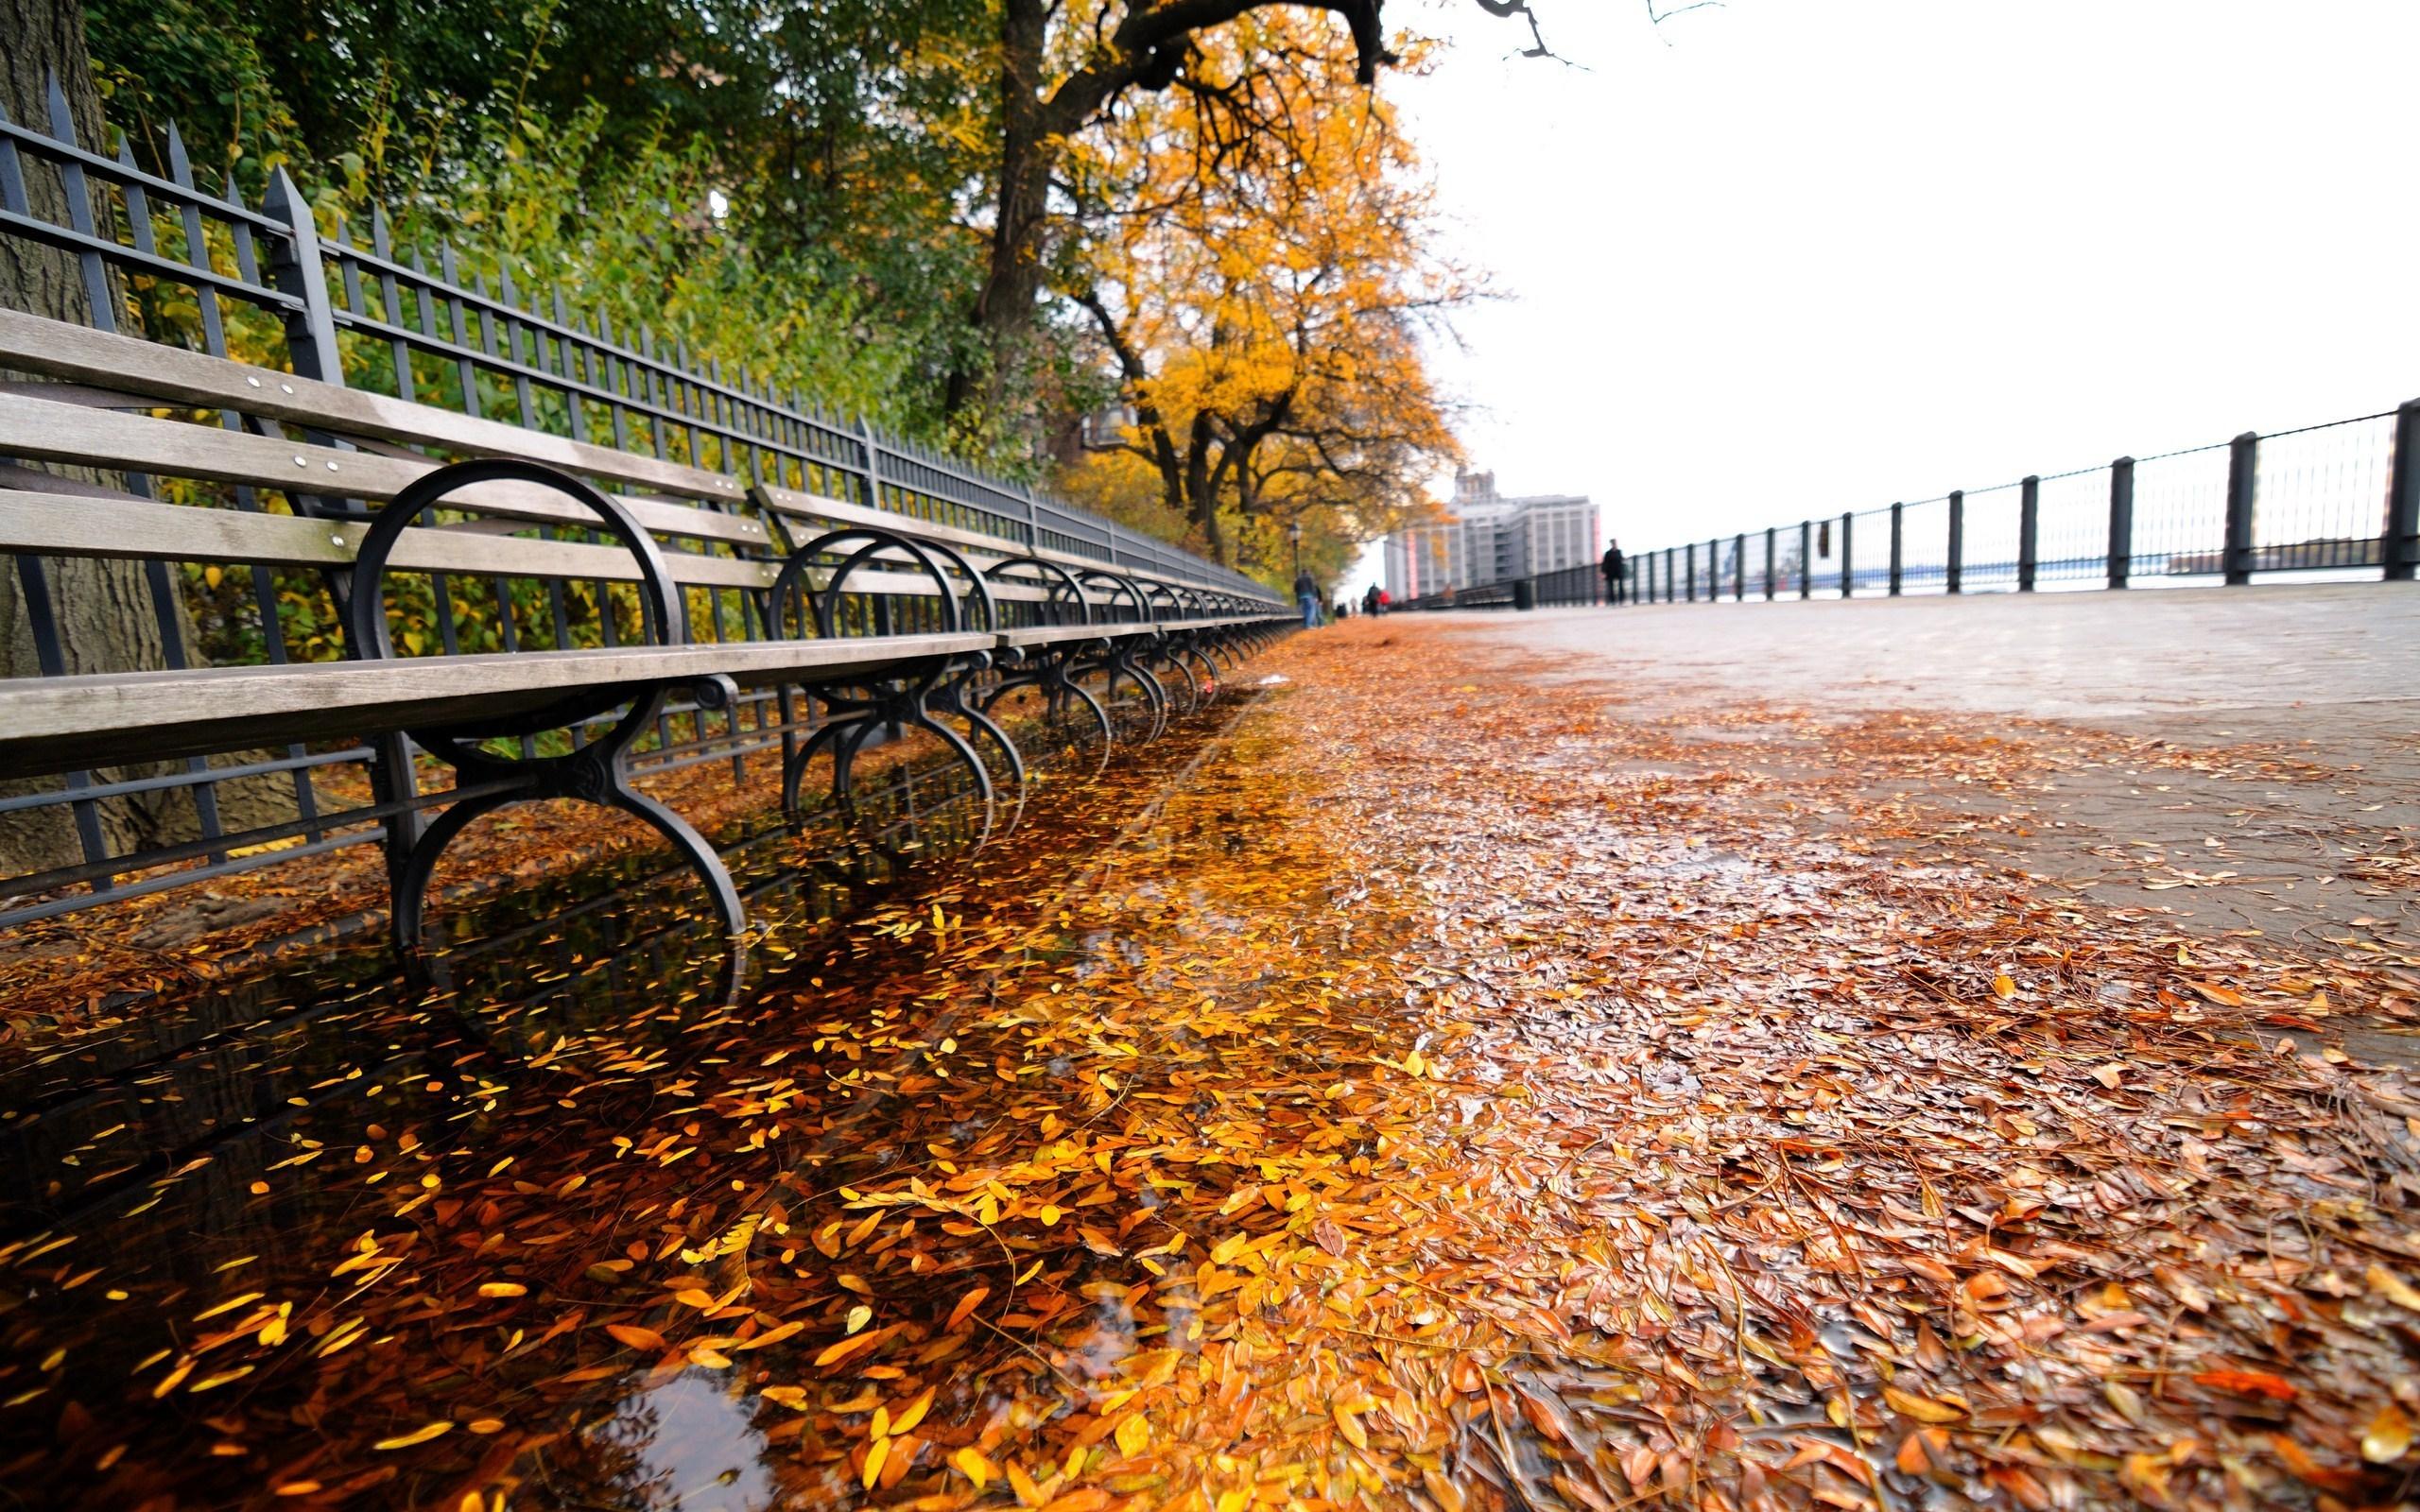 Fall Leaves Pathway Computer Wallpaper New York Waterfront Autumn Scene Desktop Wallpaper